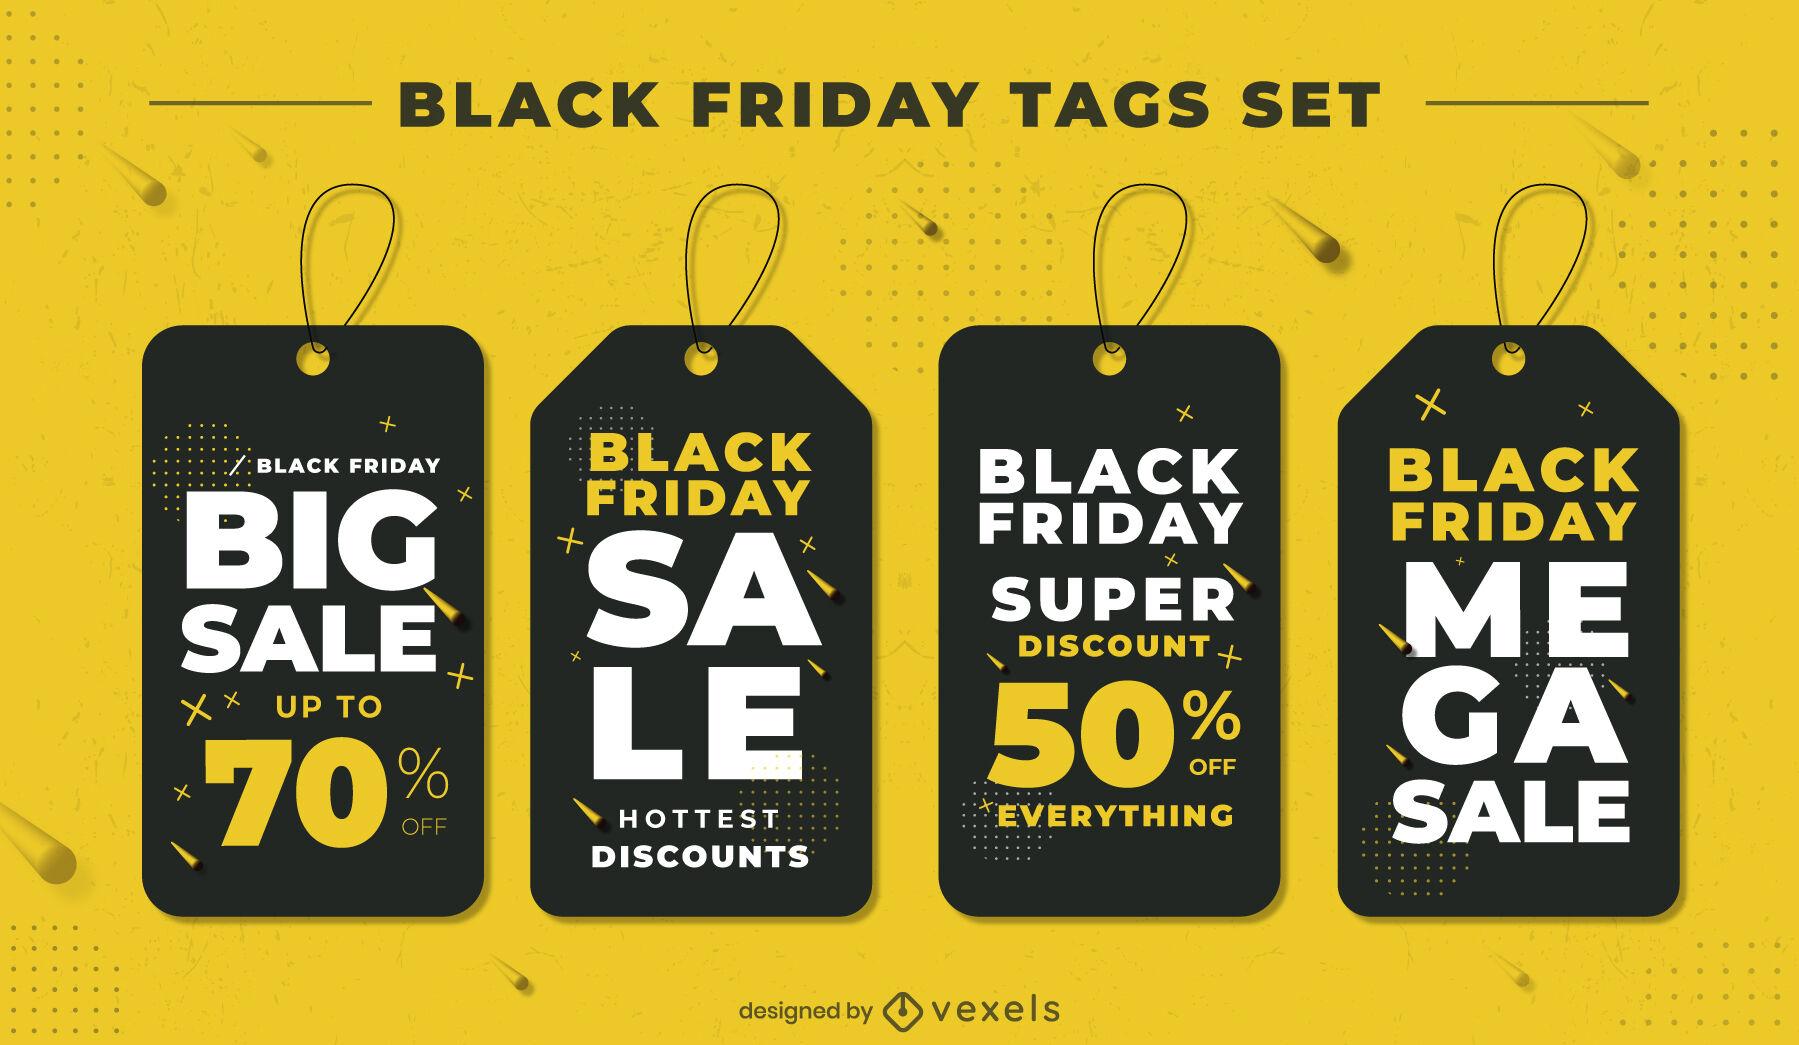 Black friday promotion event tag set